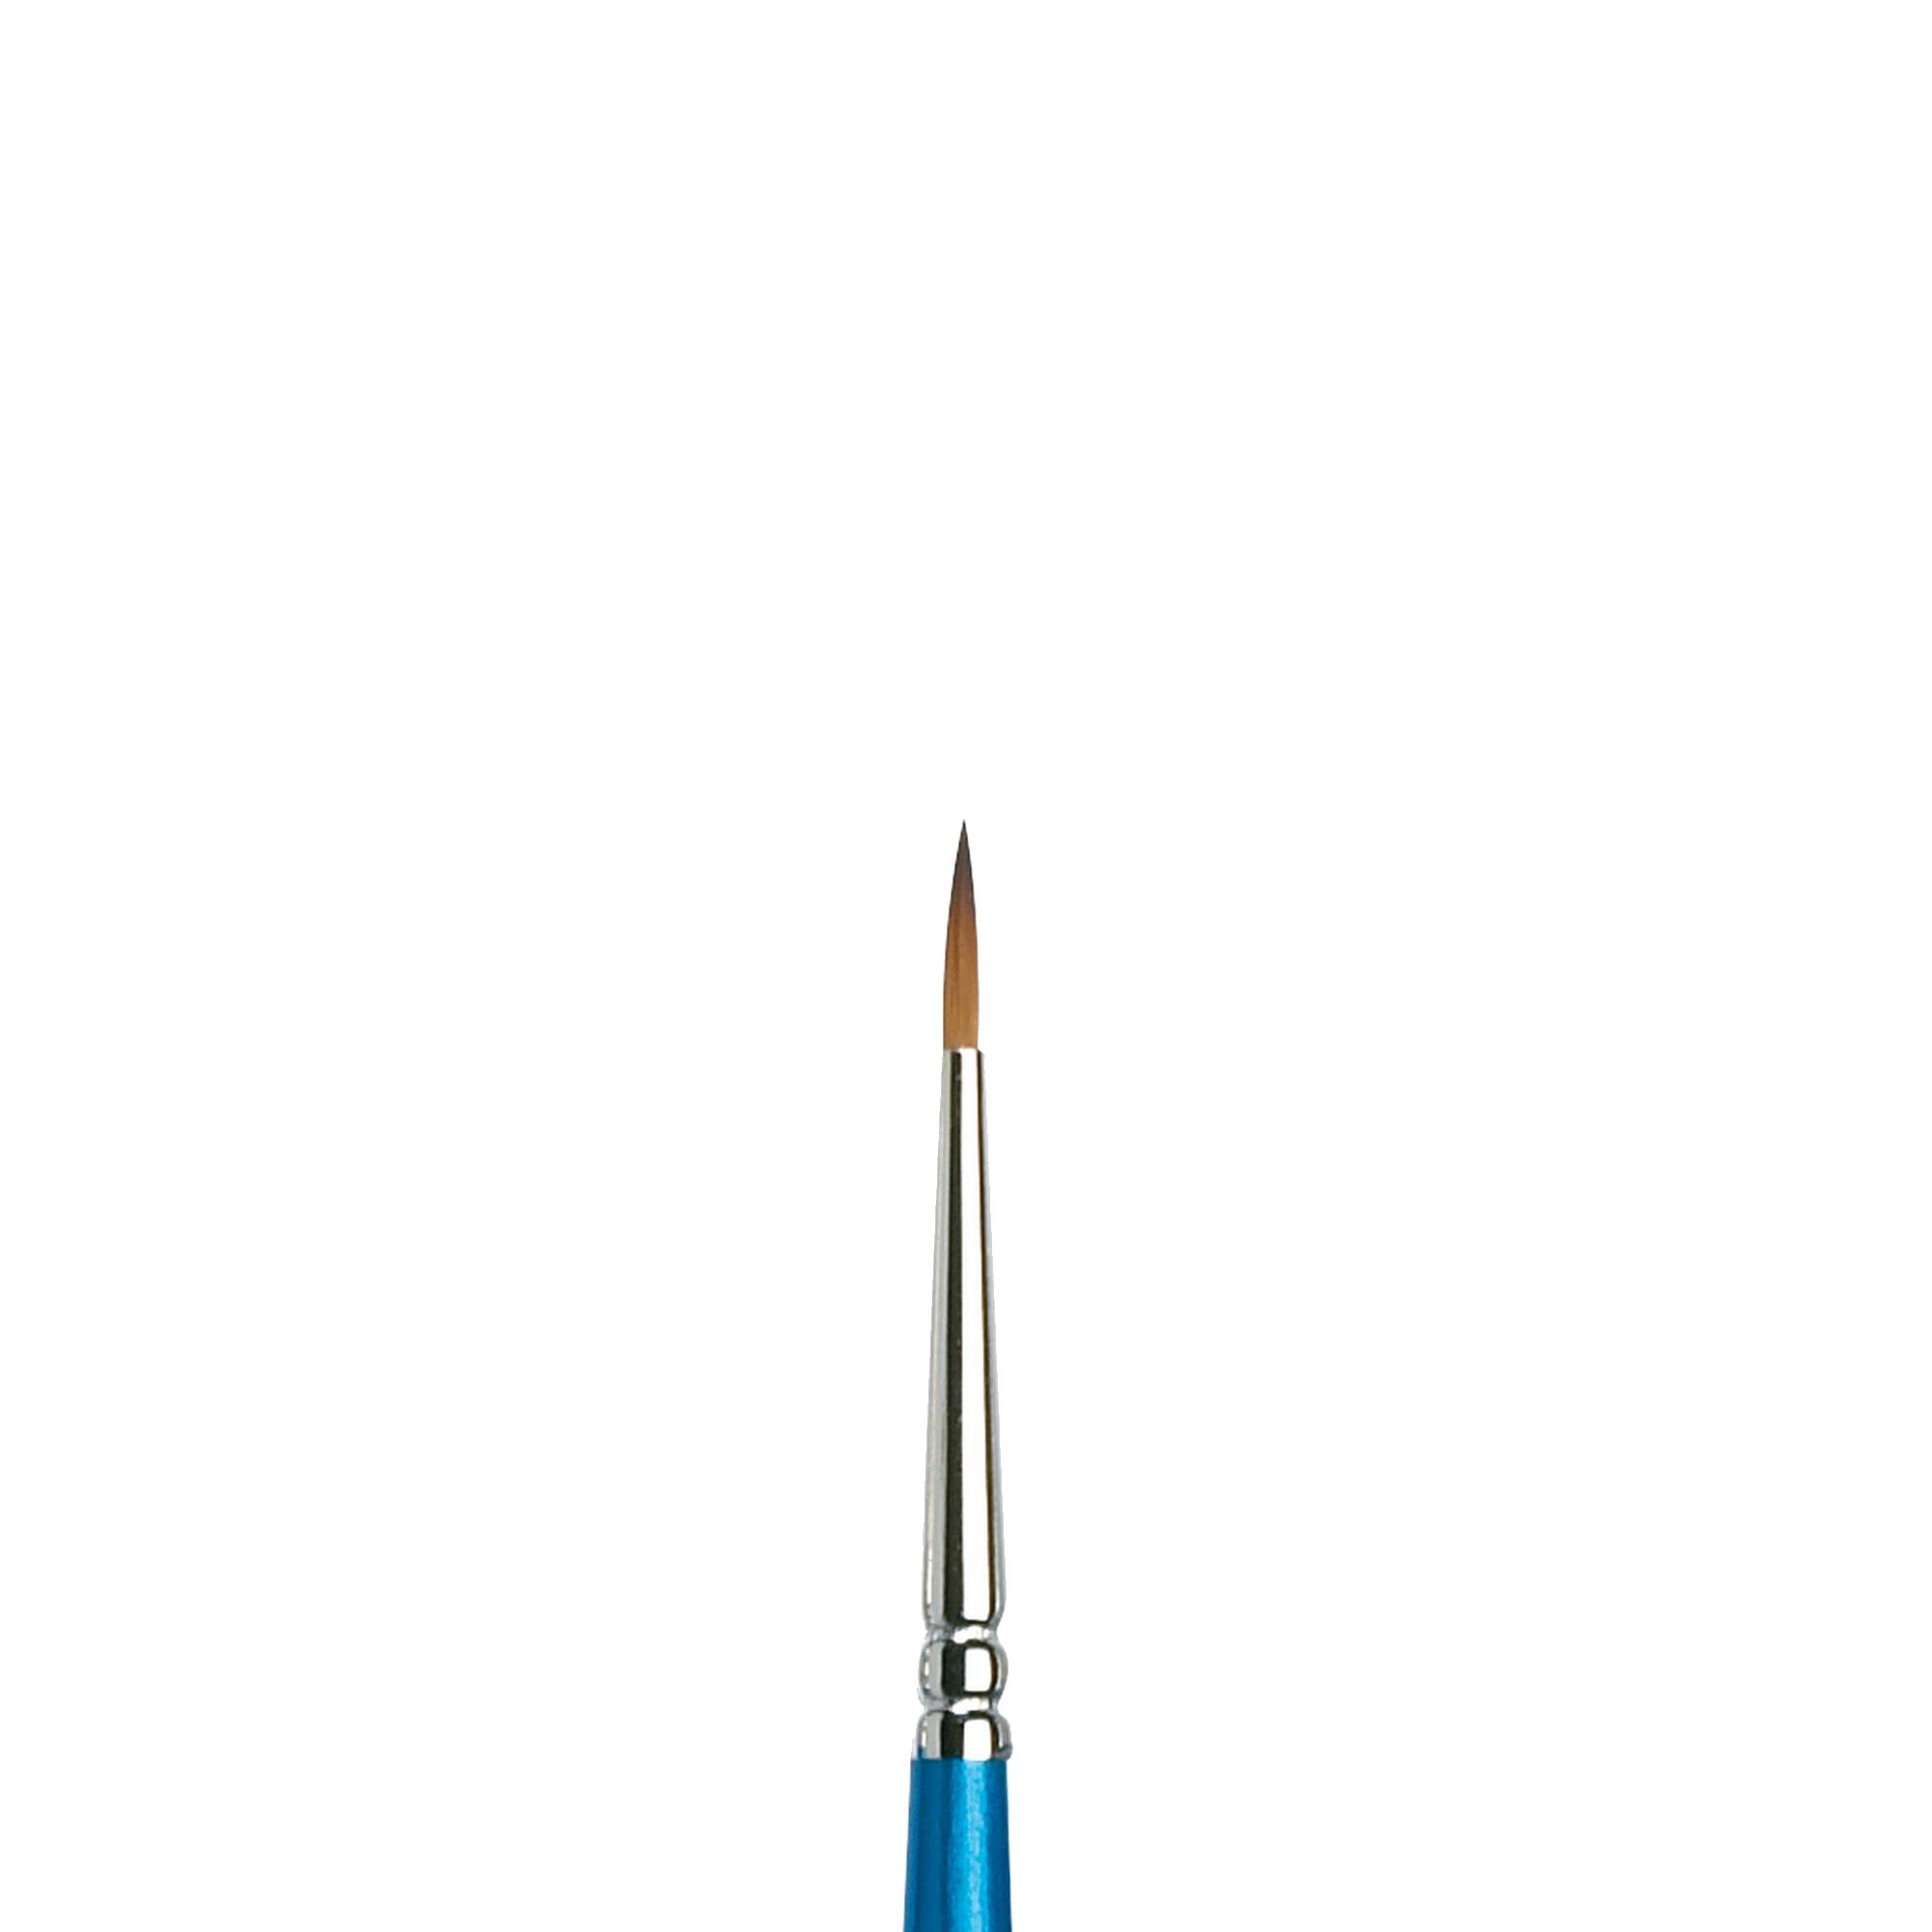 PINCEL WINSOR COTMAN NYLON REDONDO N01 RF111